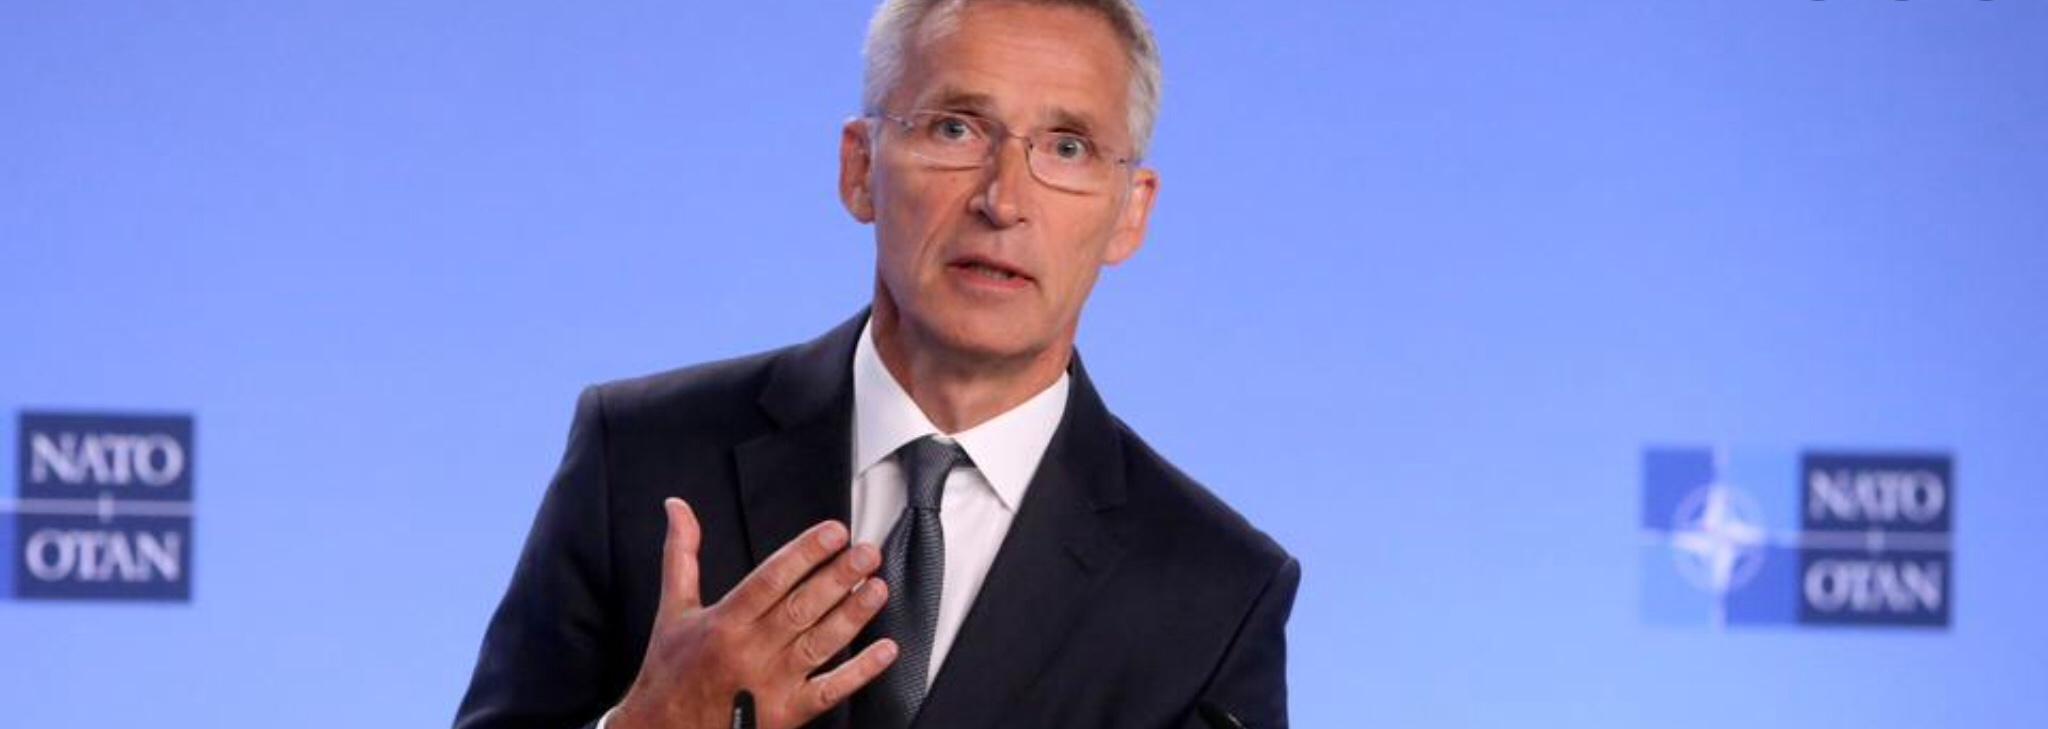 NATO welcomes Afghan Eid al-Fitr ceasefire